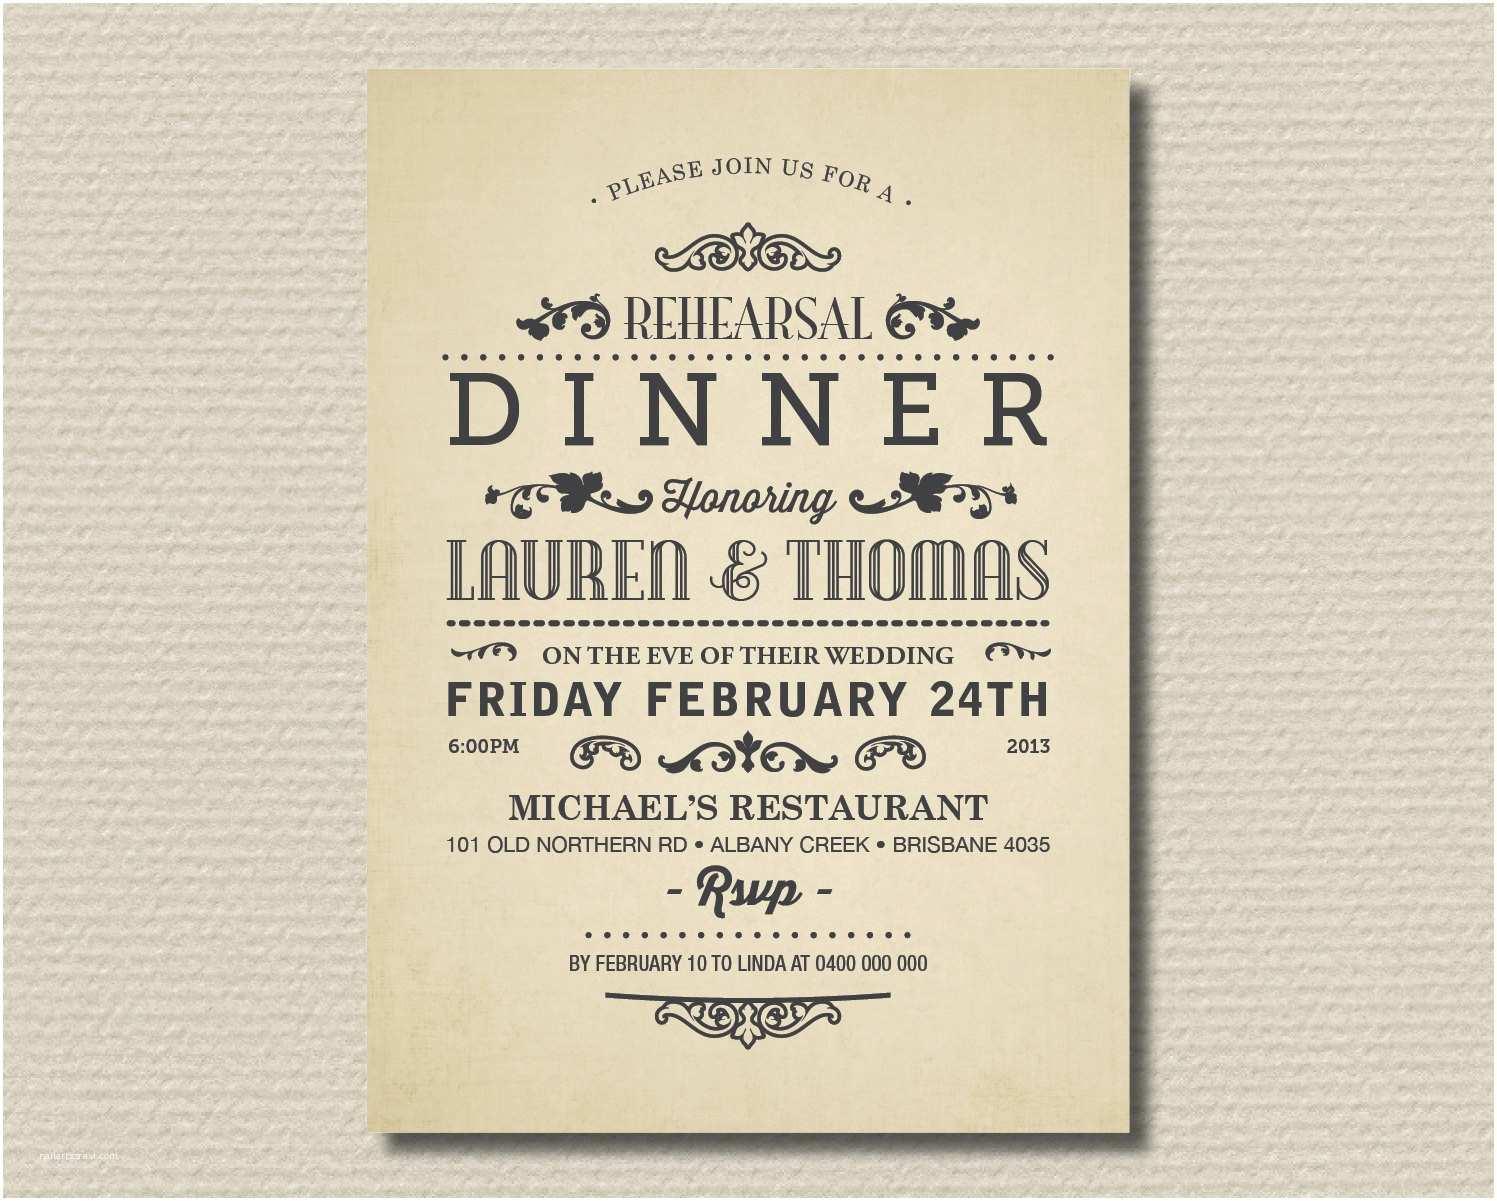 Wedding Dinner Party Invitation Wording Dinner Party Invitation Wording Template